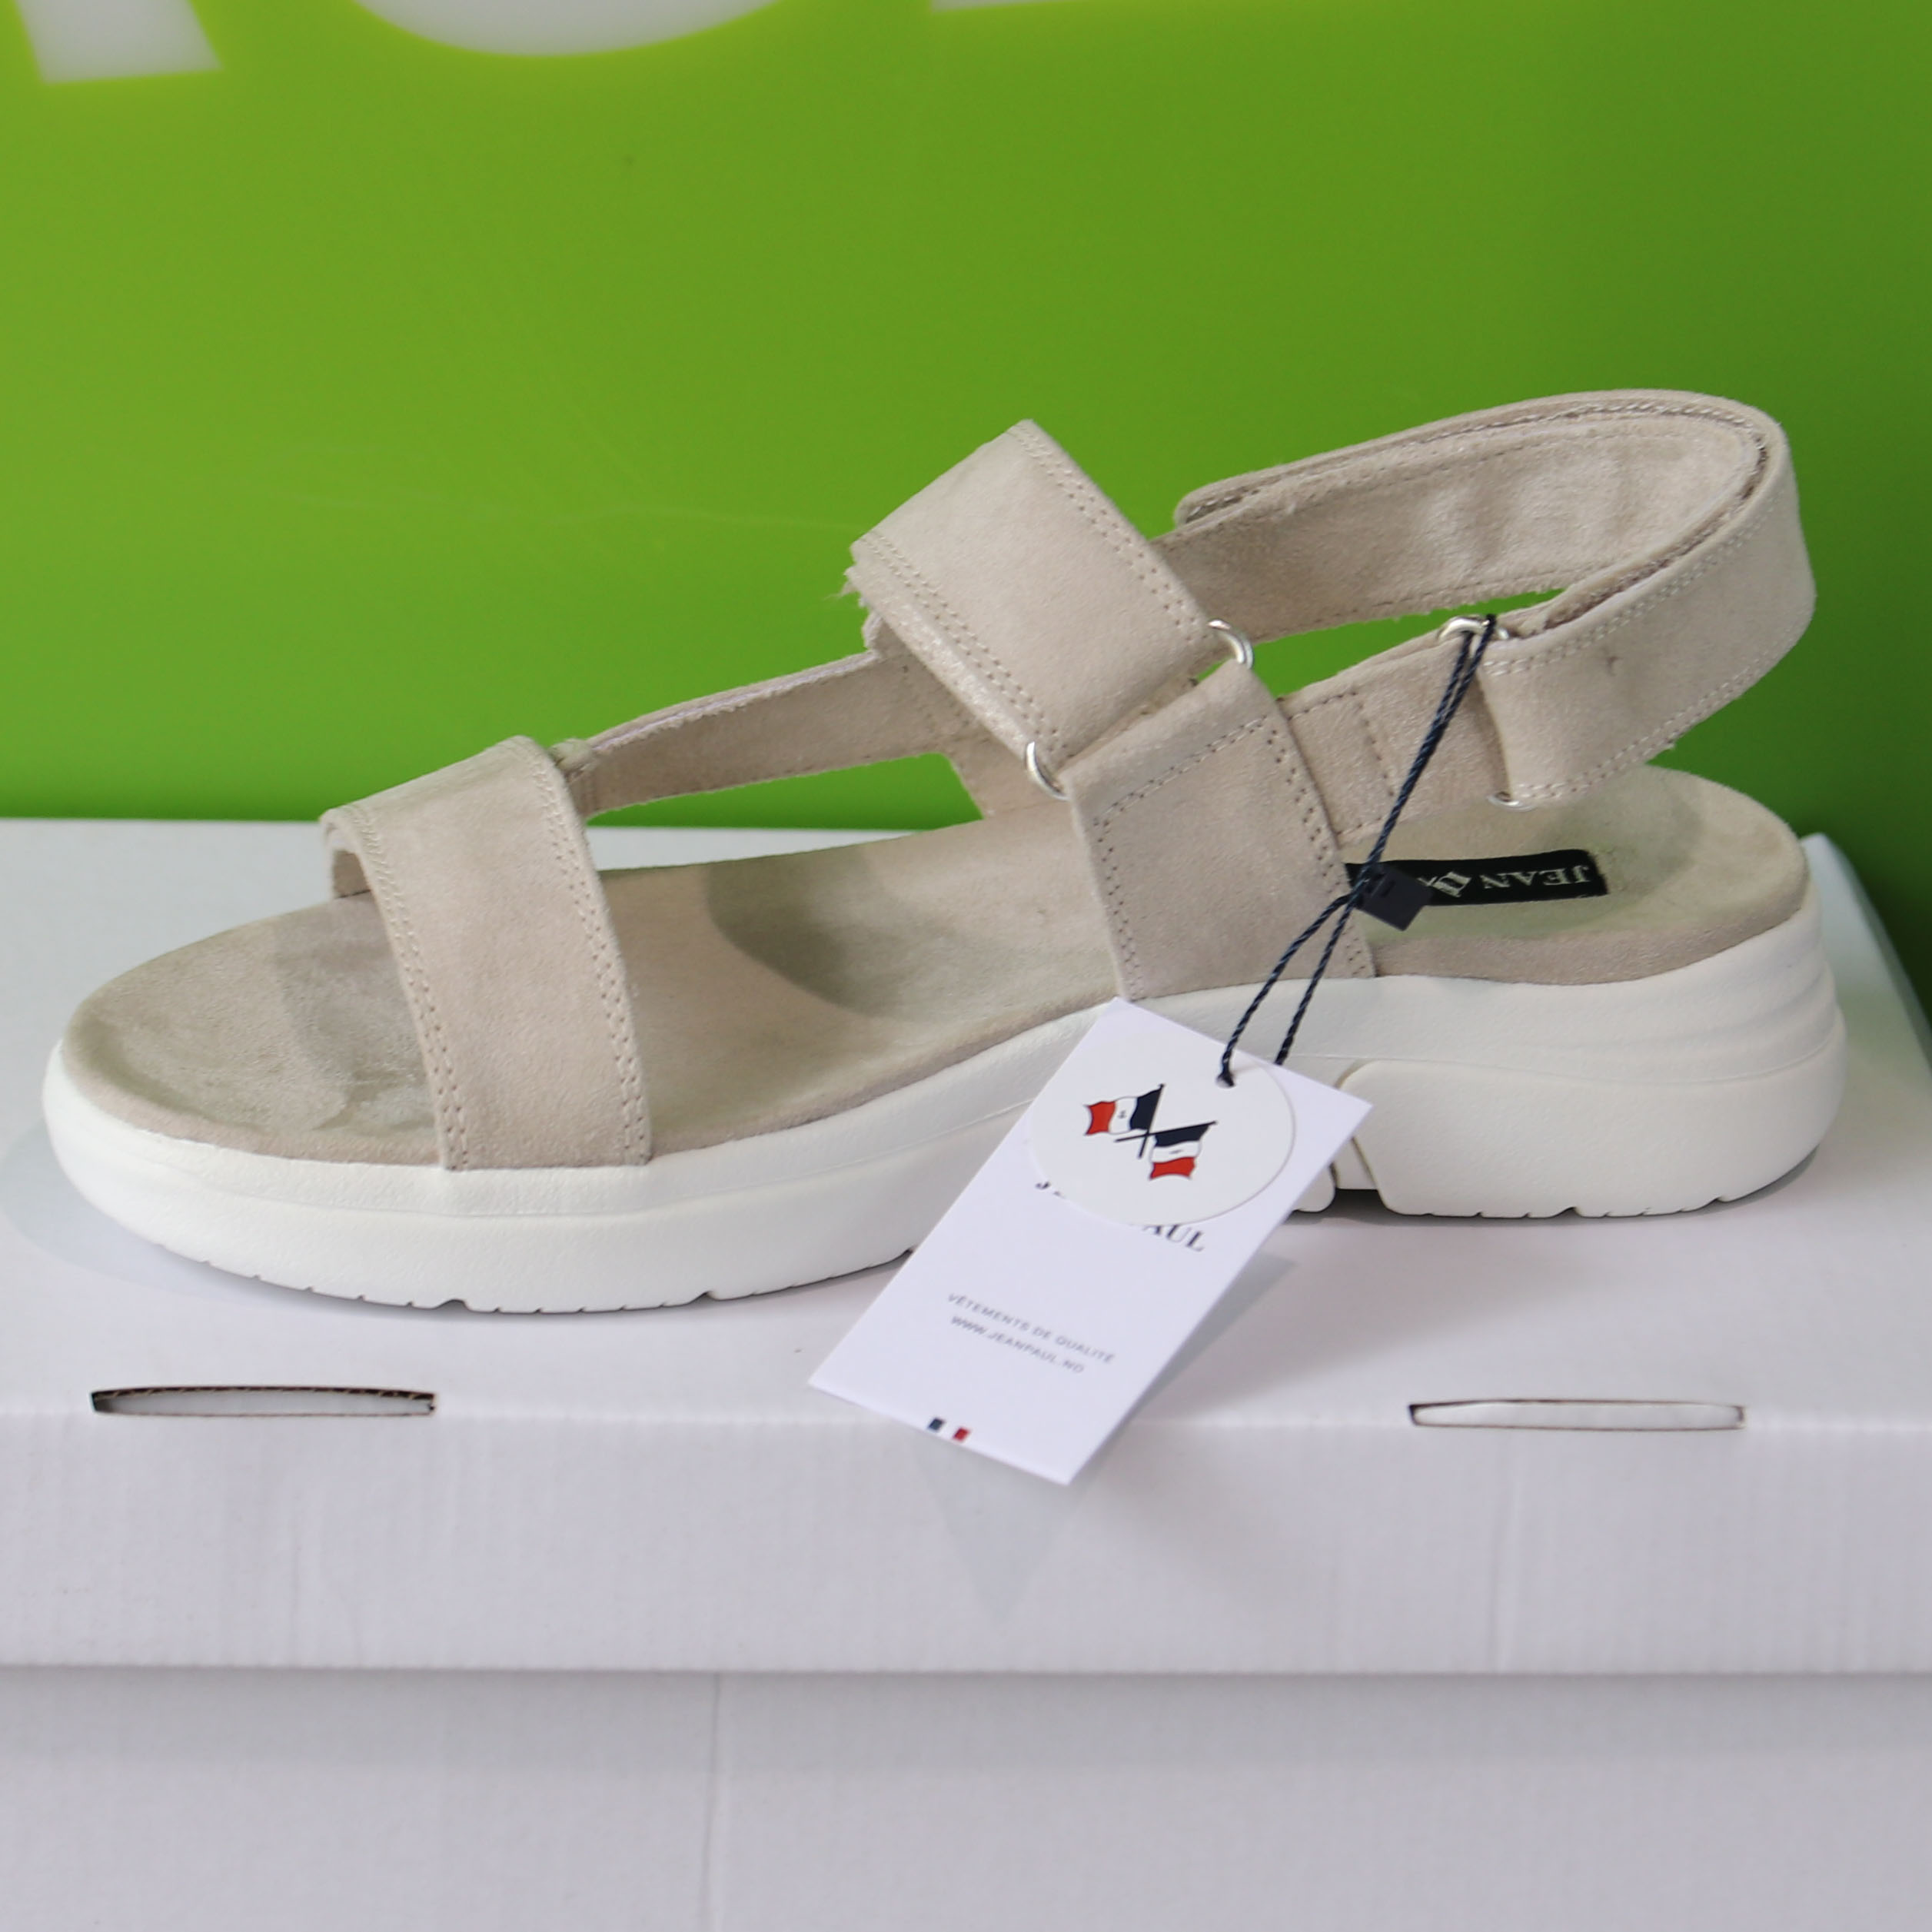 jean paul – vecchio sommersko dame sandaler4